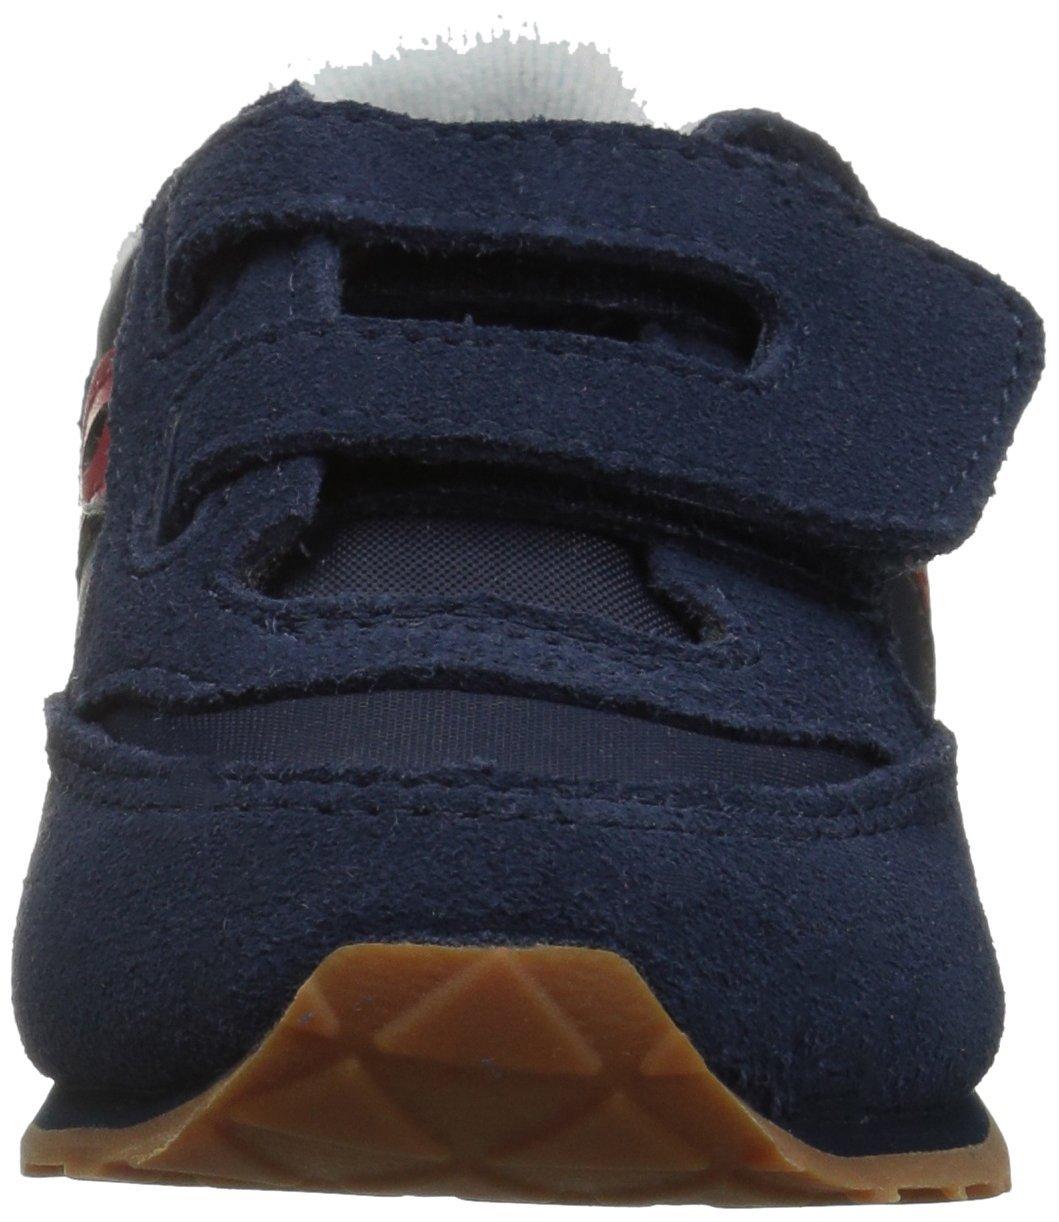 Saucony Jazz Hook & Loop Sneaker (Toddler/Little Kid), Navy/Red, 12 M US Little Kid by Saucony (Image #4)